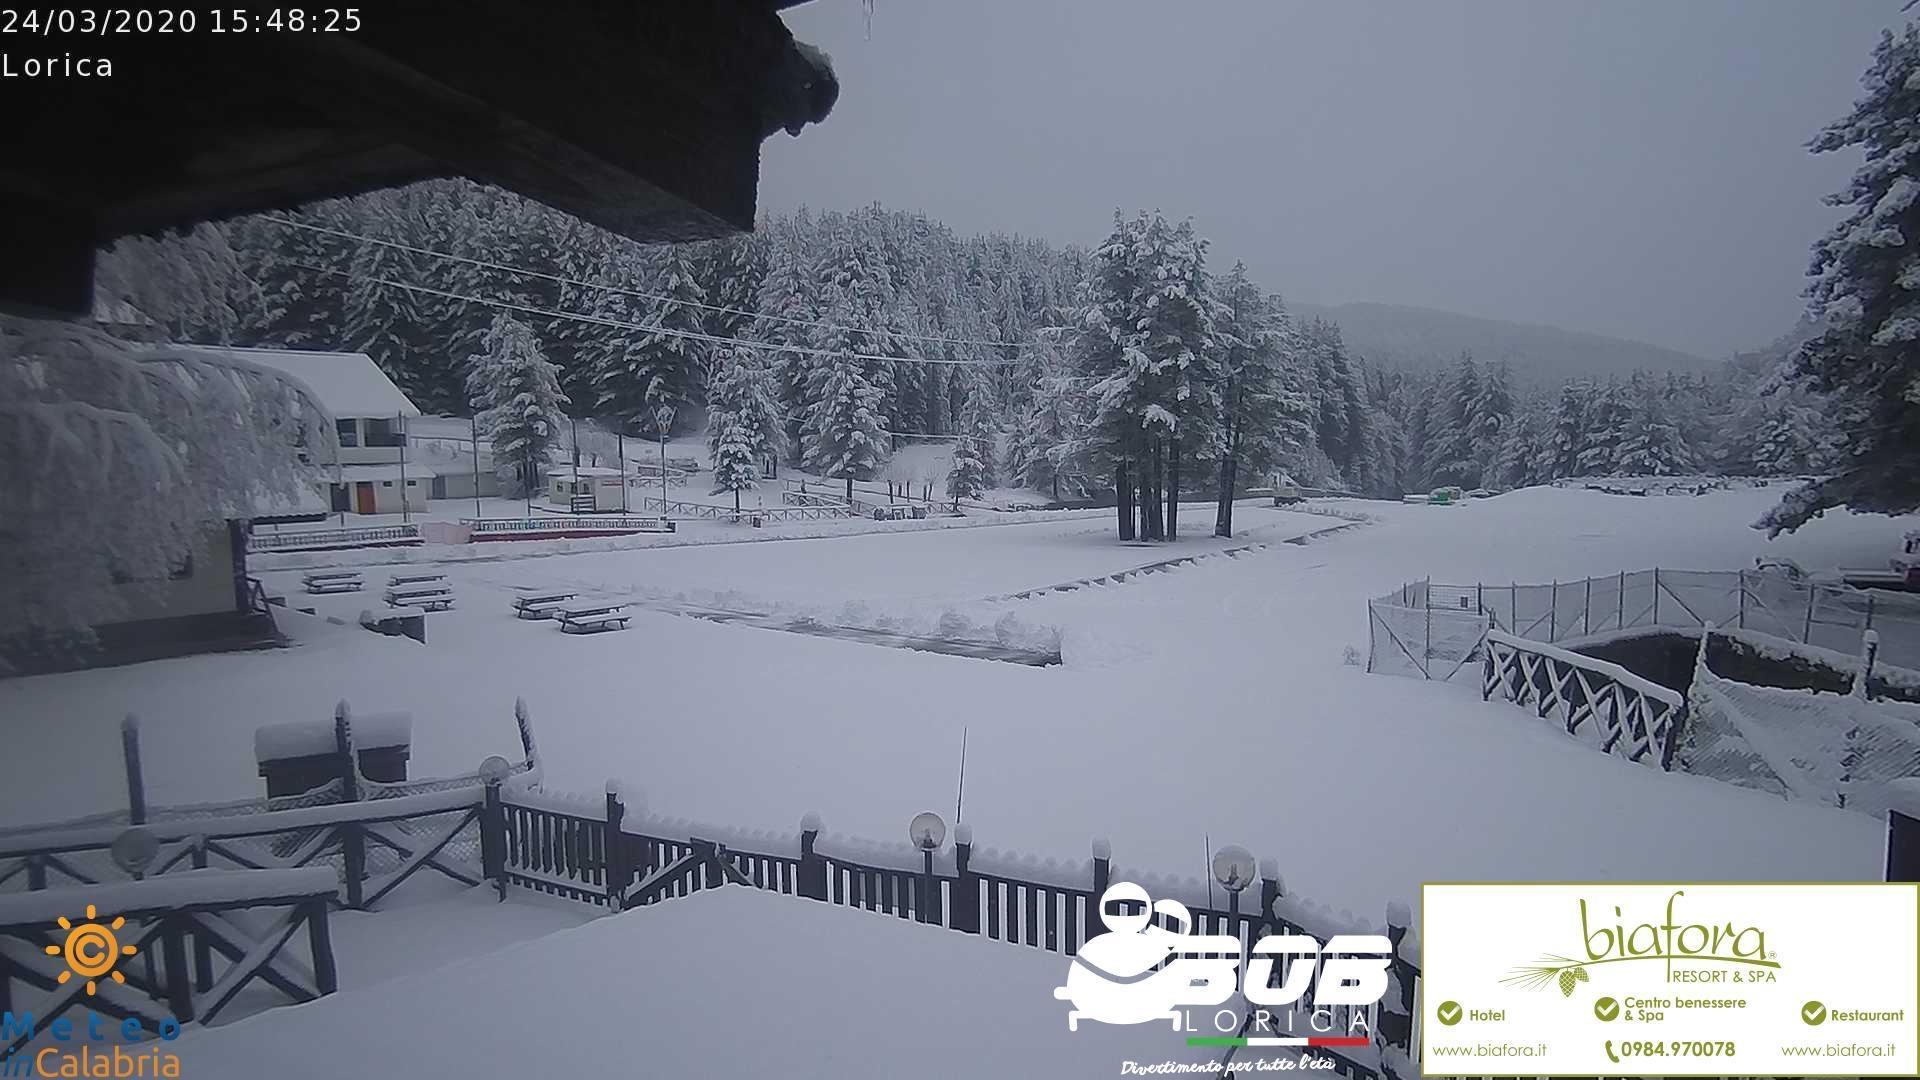 neve Lorica sila 27 marzo 2020